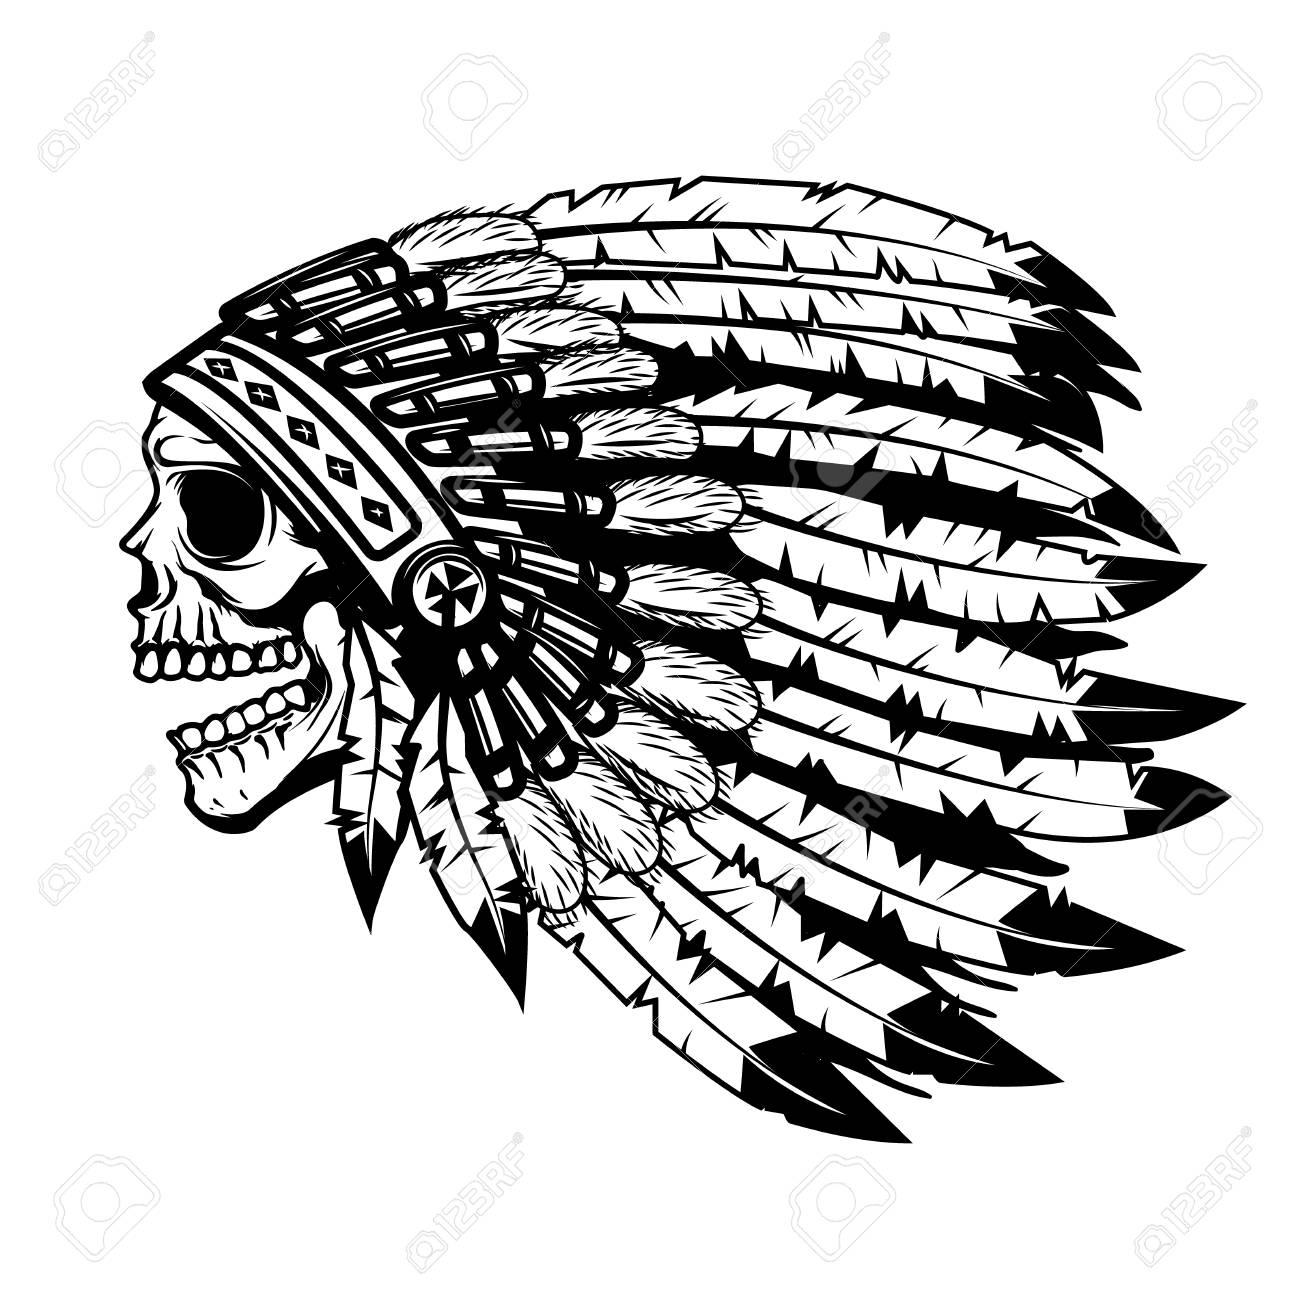 1299x1300 Skull In Native American Indian Chief Headdress. Design Element